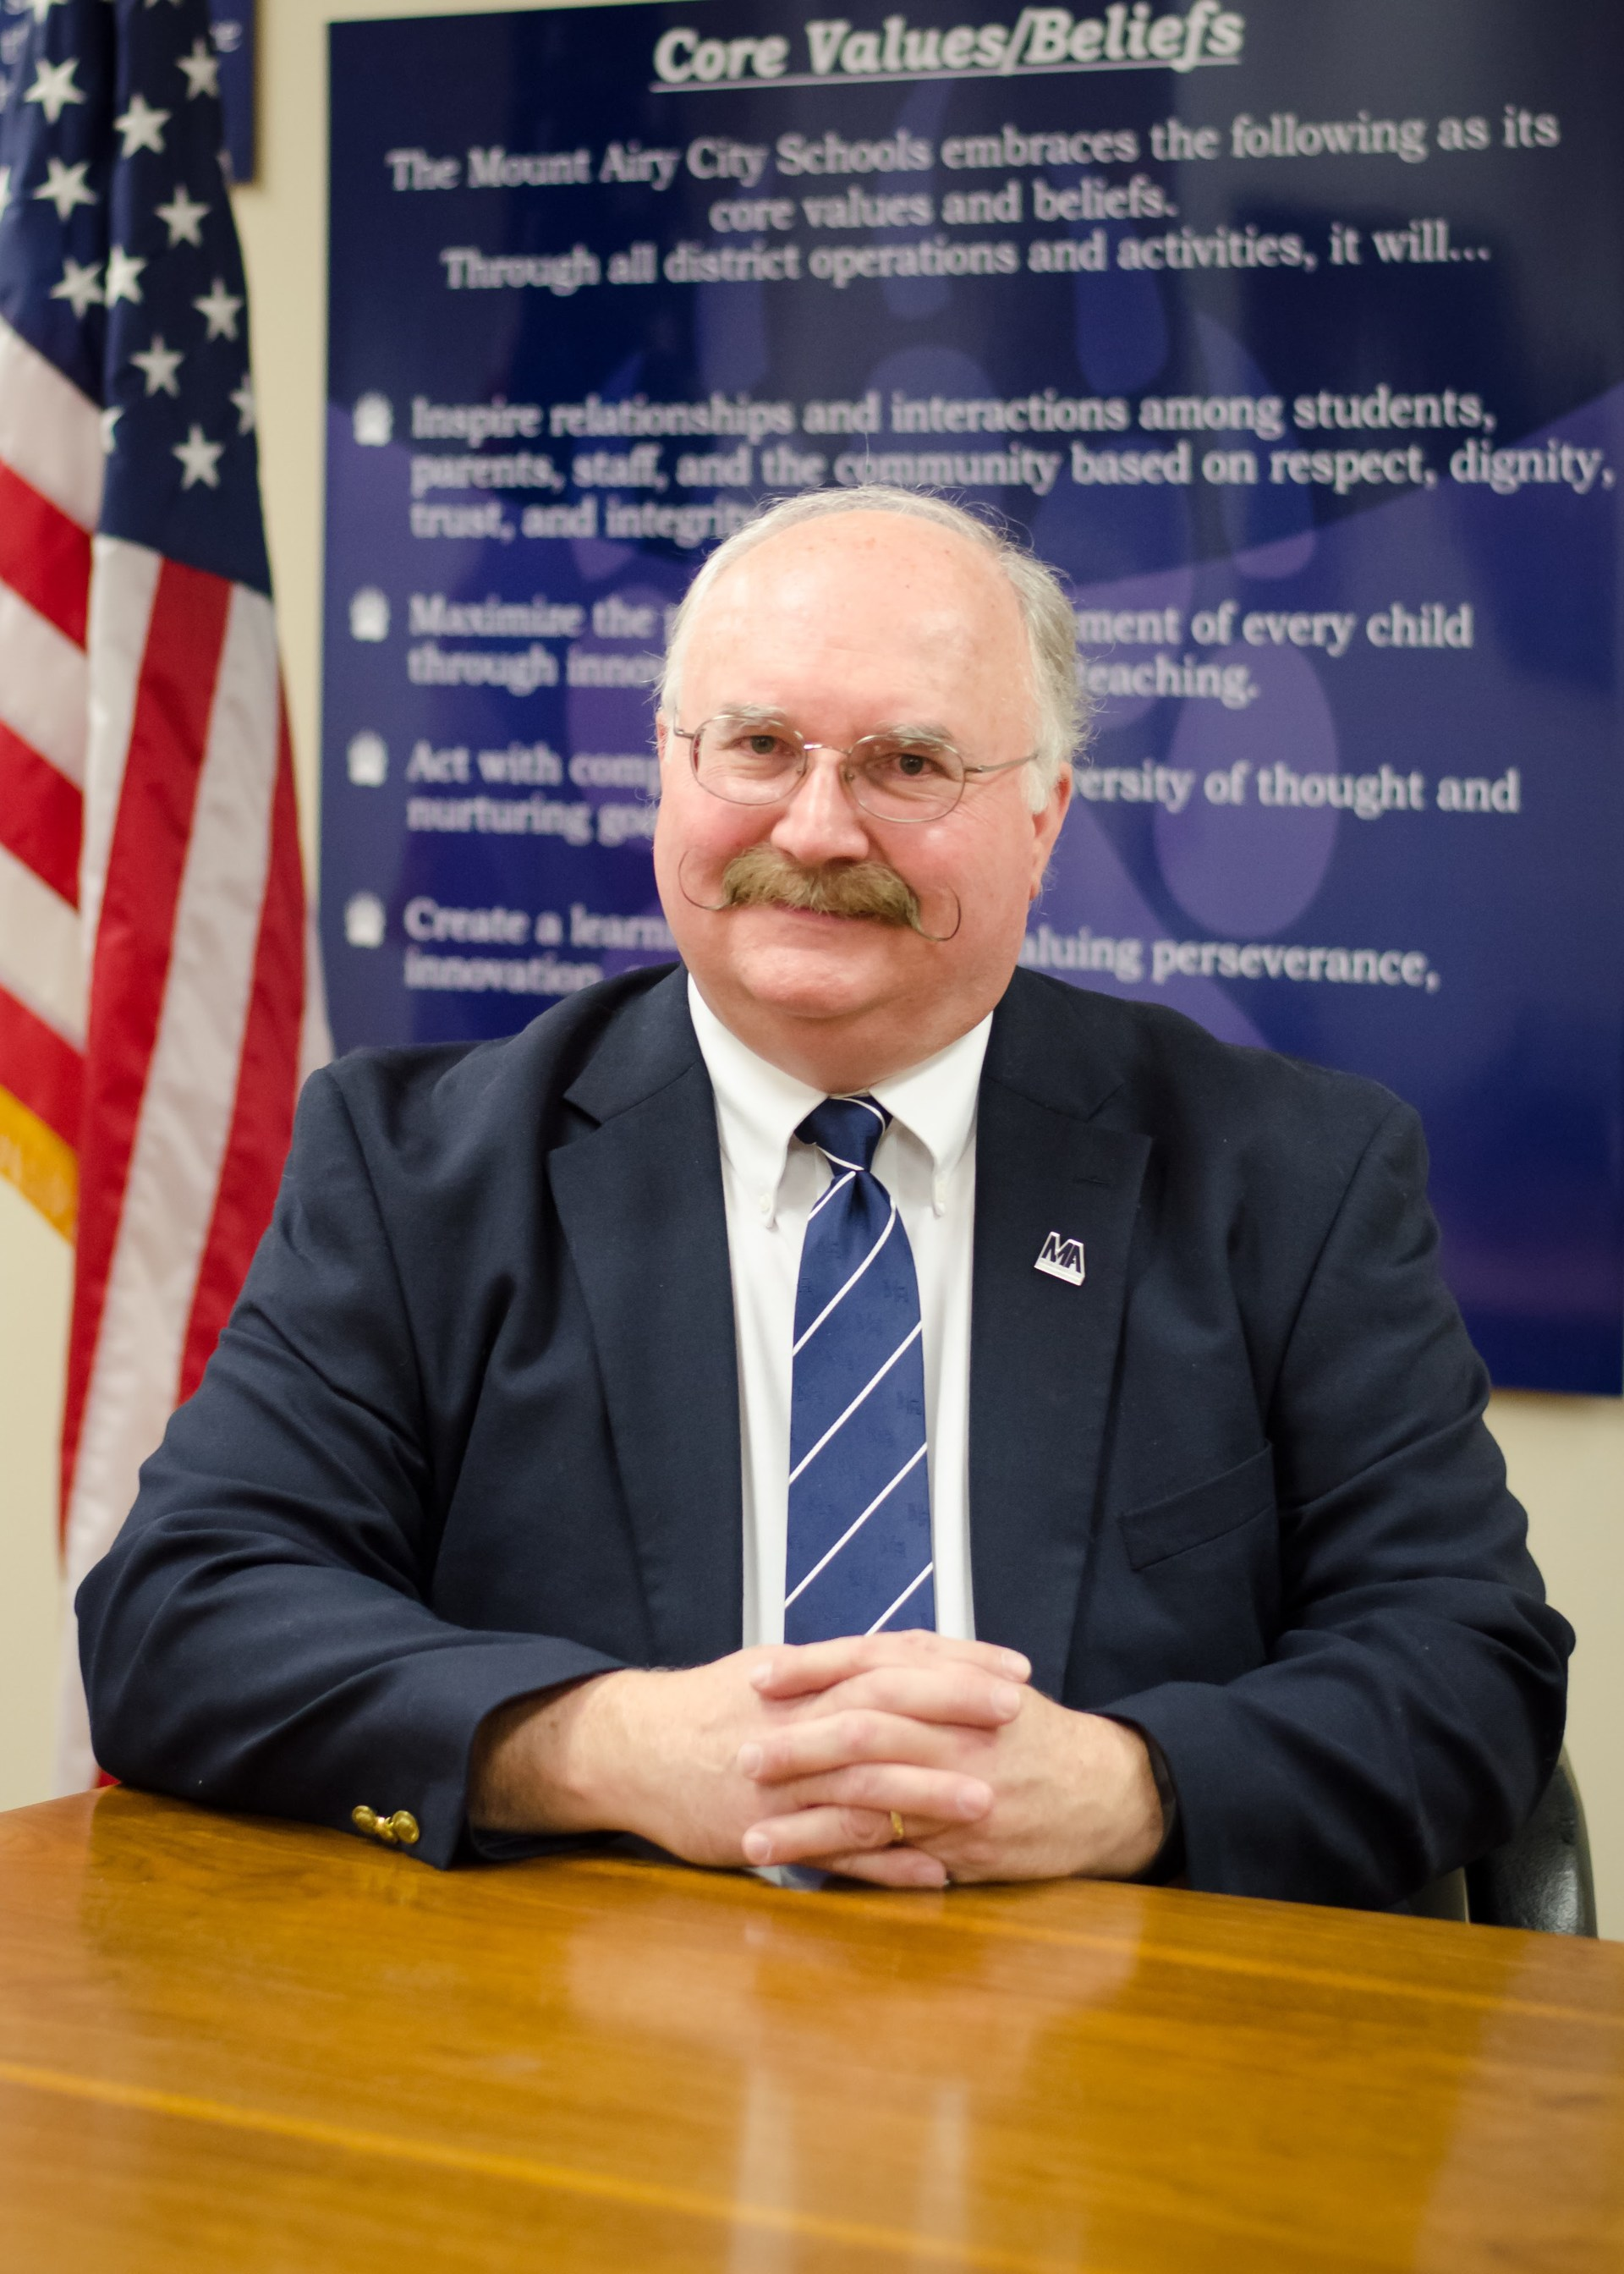 Meet The Board Board Of Education Mount Airy City Schools